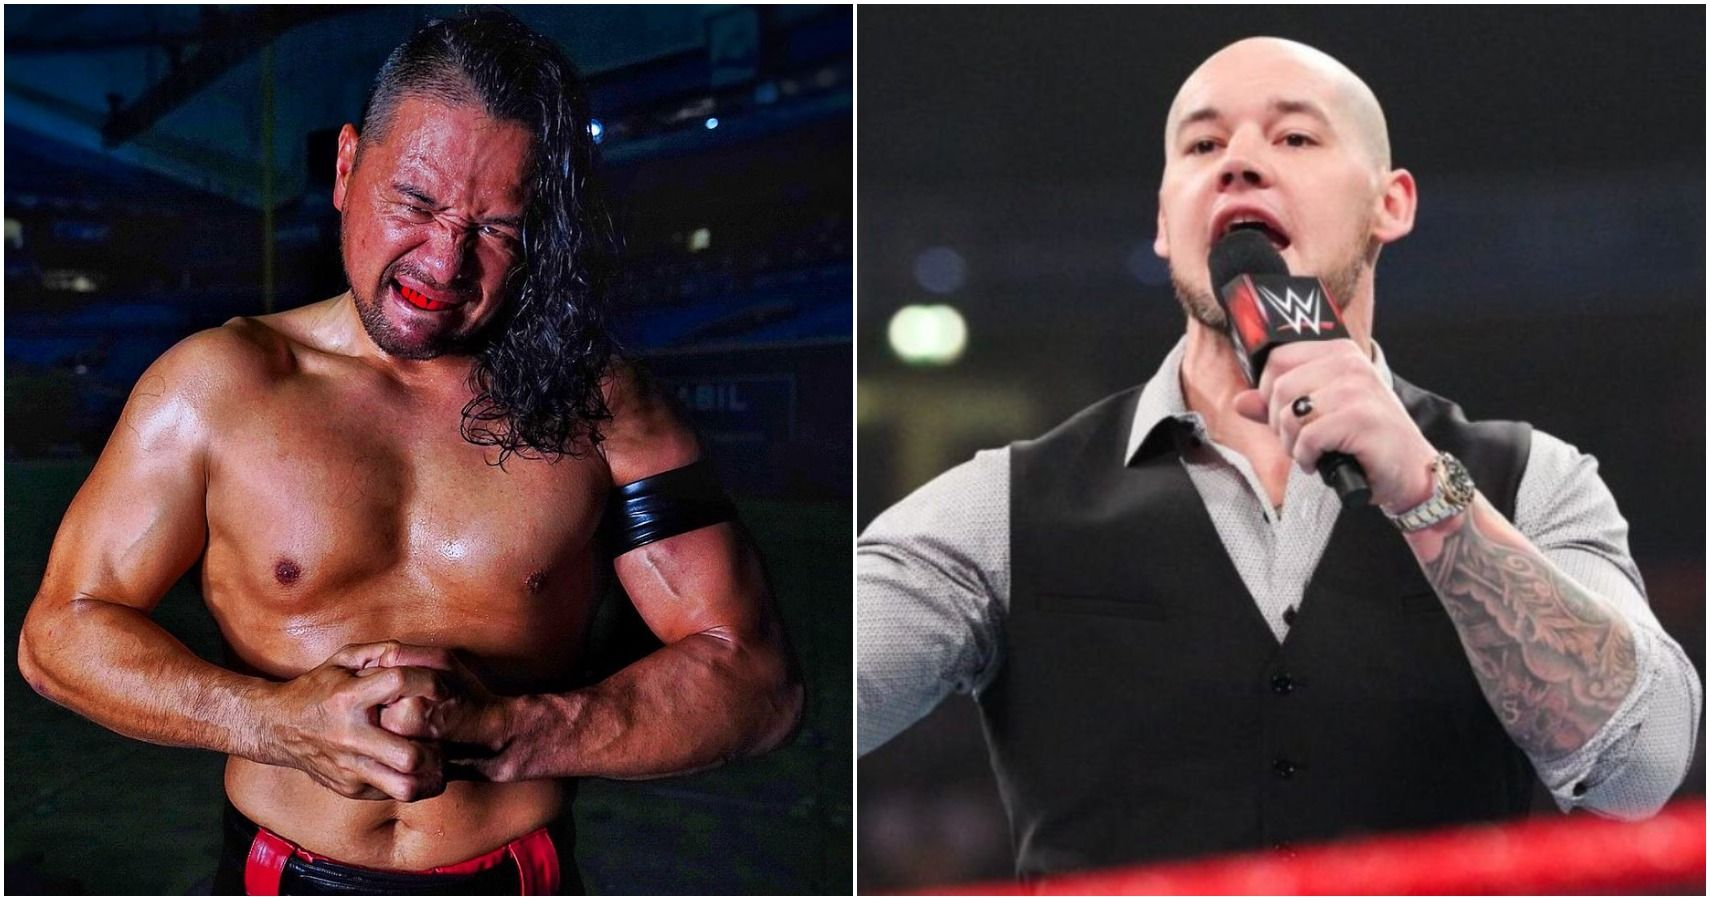 WWE's Shinsuke Nakamura Vs. Baron Corbin Feud Is 50/50 Booking At Its Worst